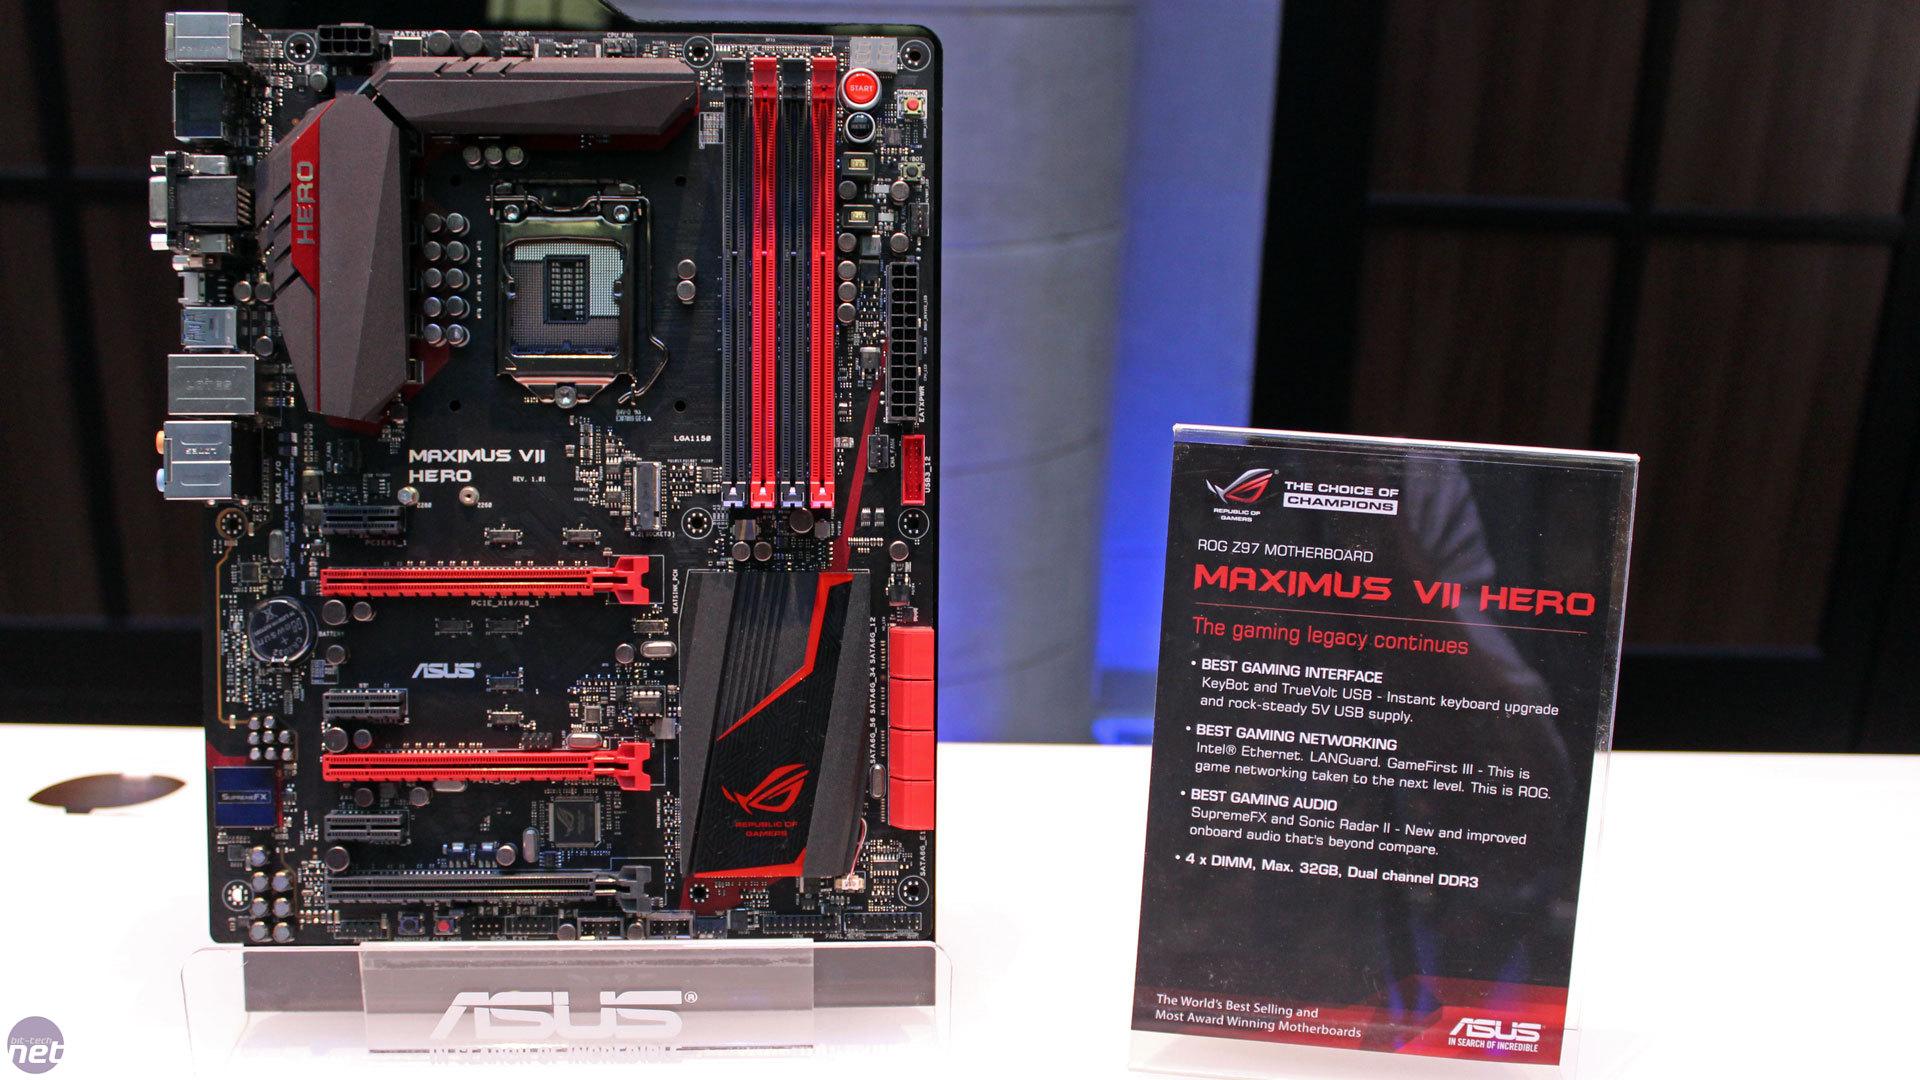 ASUS Z97 Motherboards Preview | bit-tech net